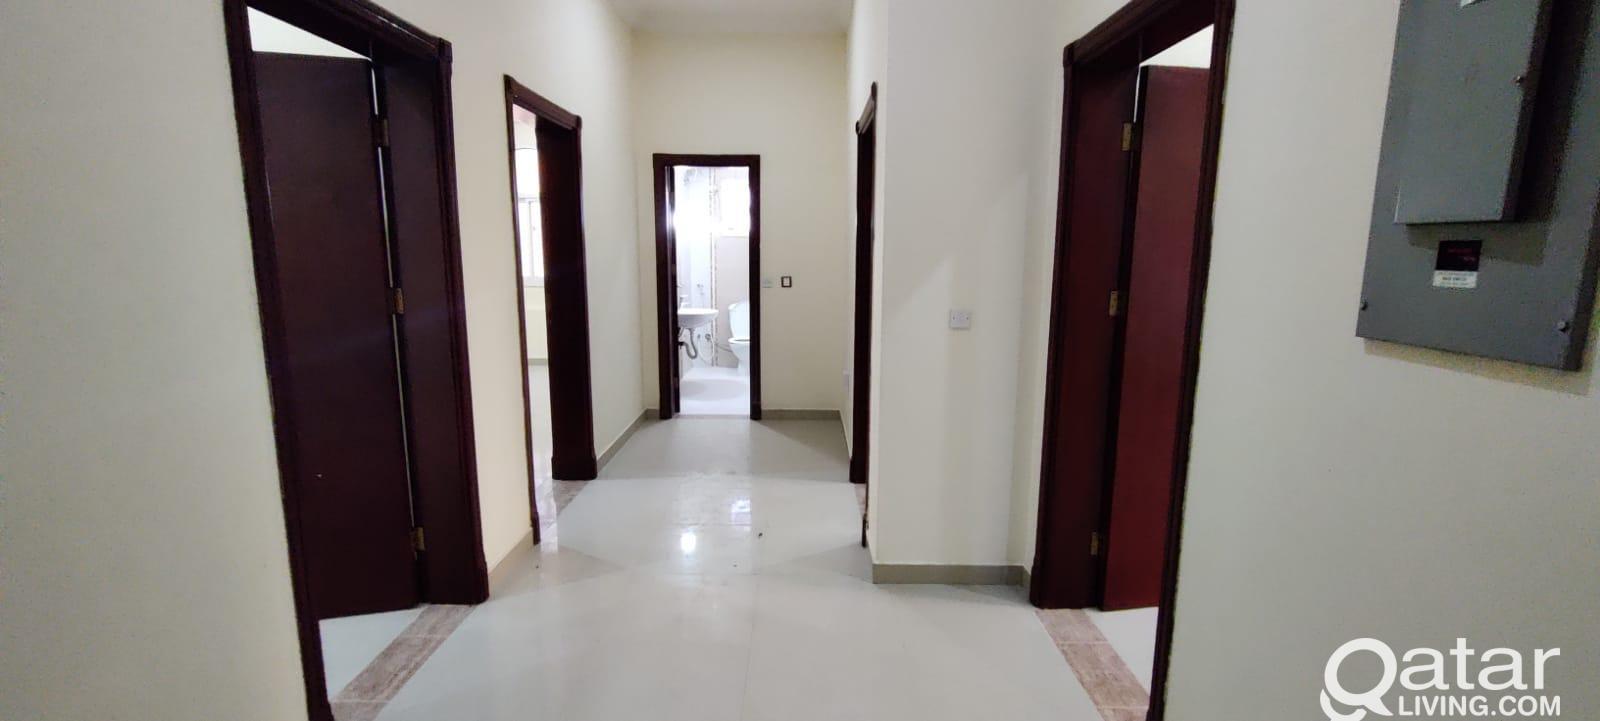 6 BHK Villa For Rent - Ainkhalid